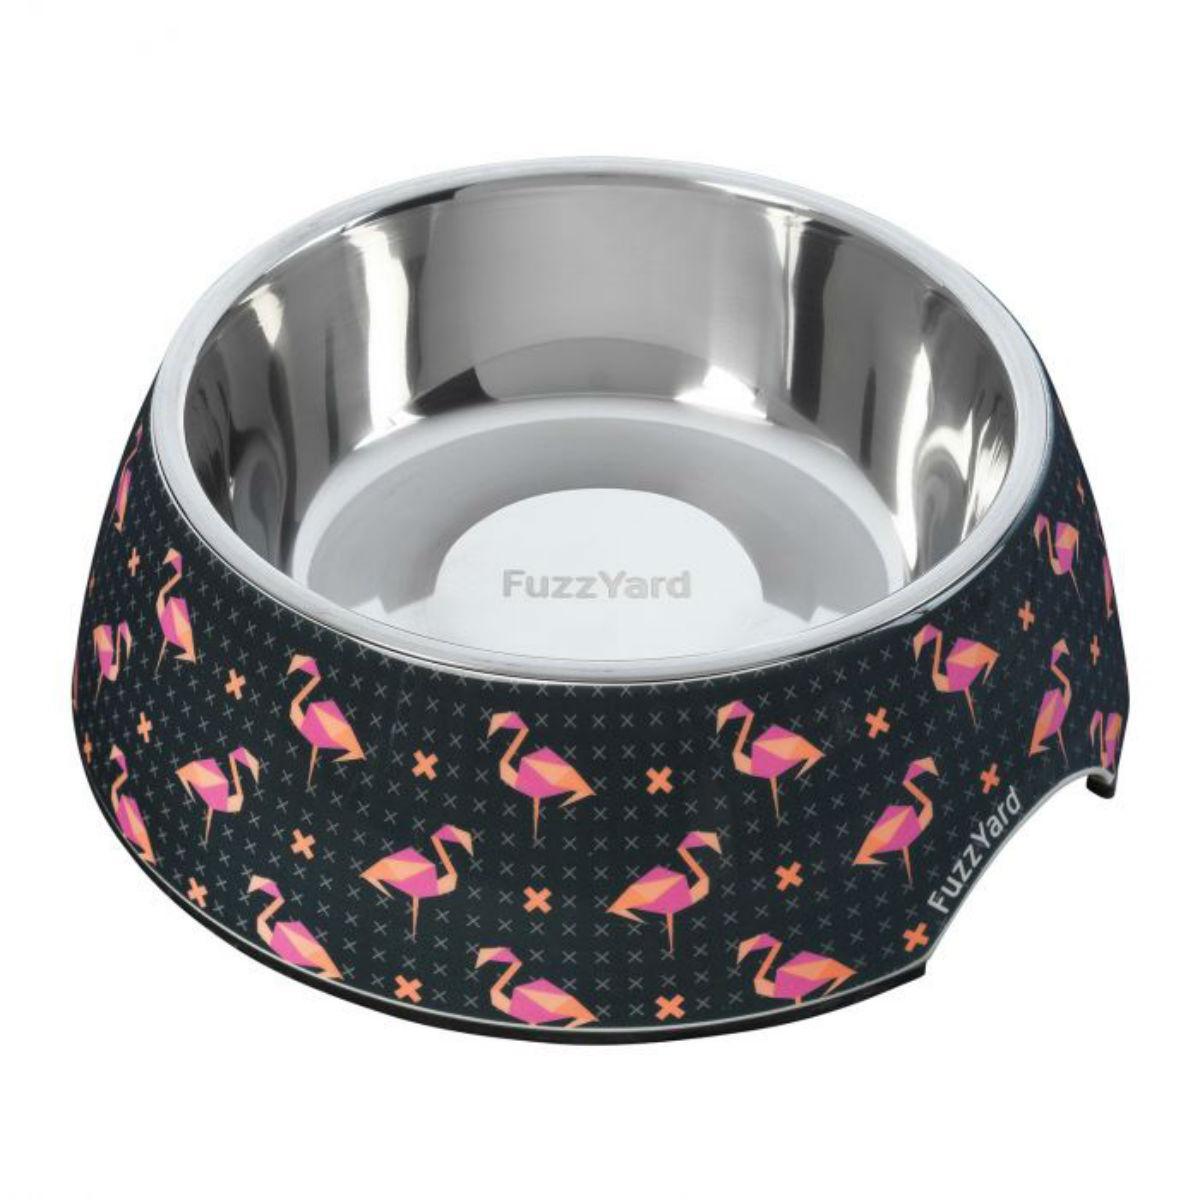 FuzzYard Fabmingo Easy Feeder Dog Bowl